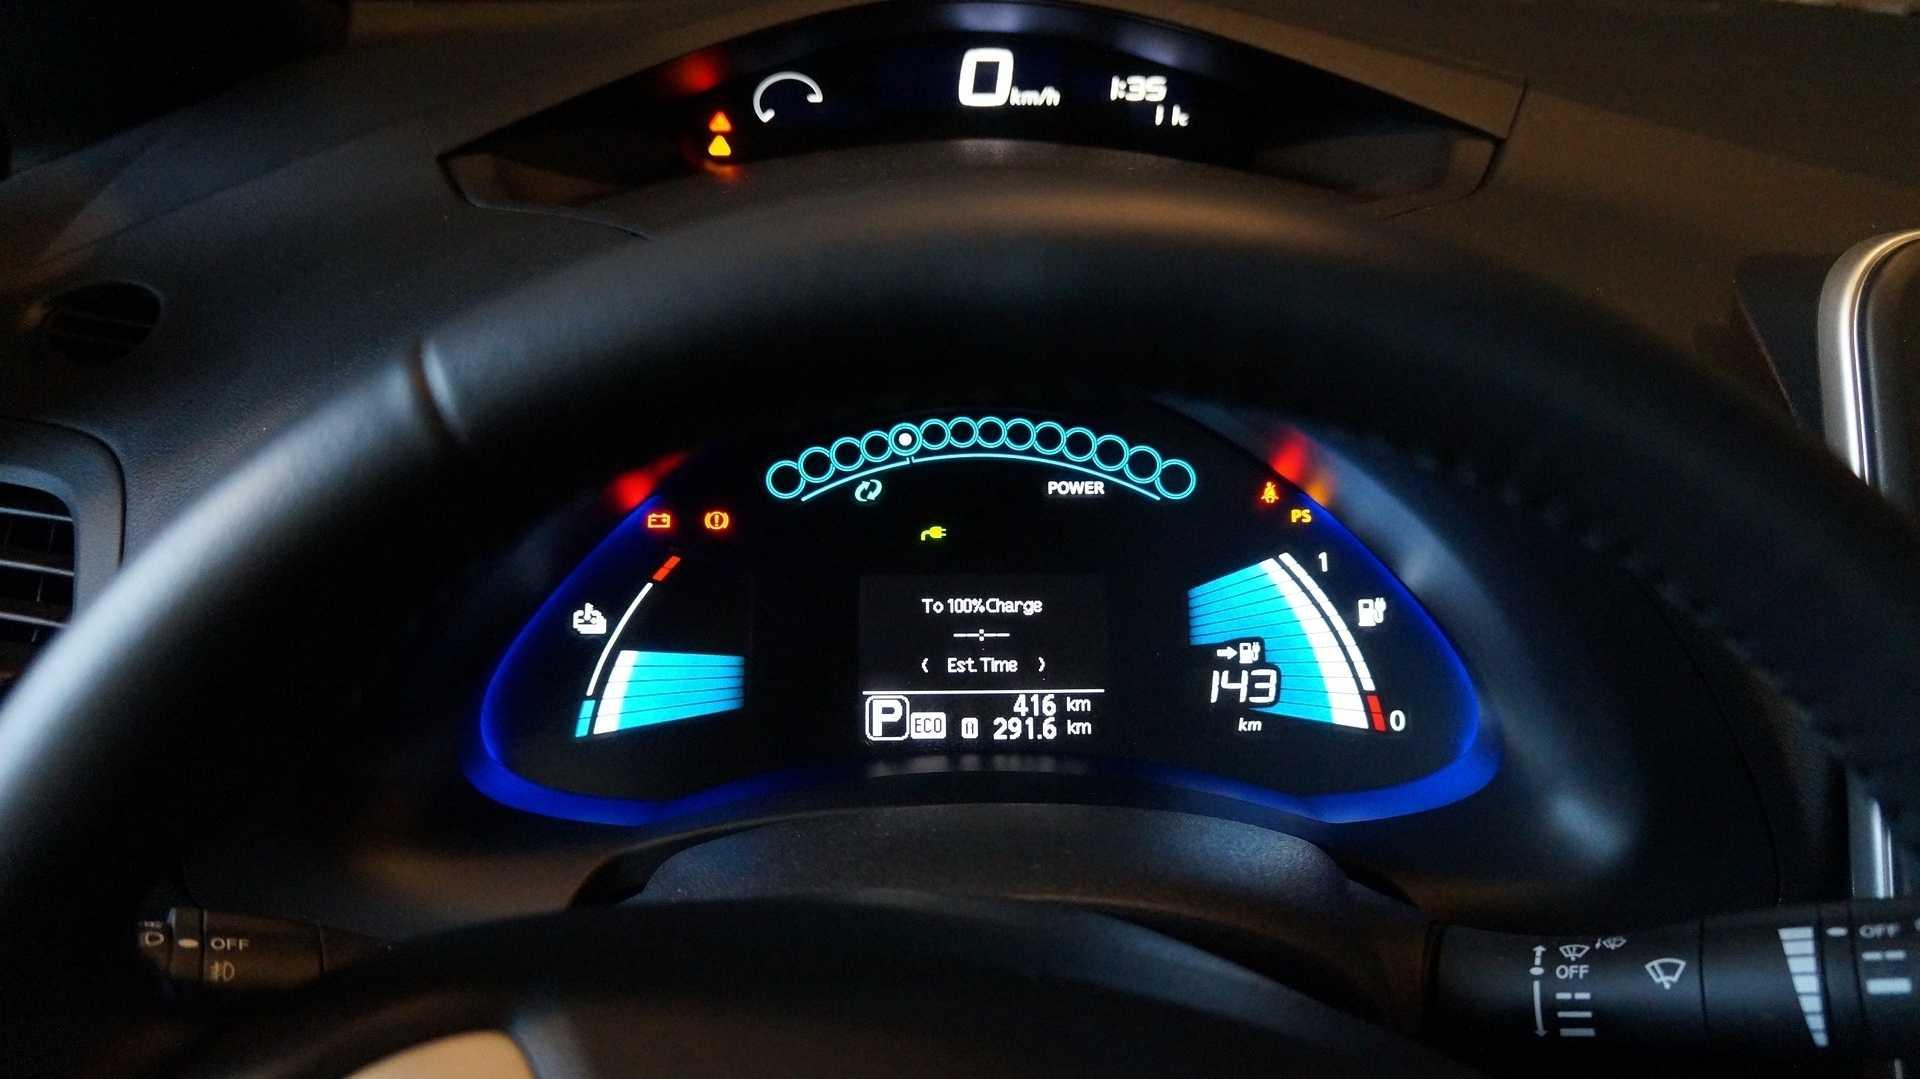 Denkendorfer Tüftler arbeiten an Sensorik für Batterien in E-Autos